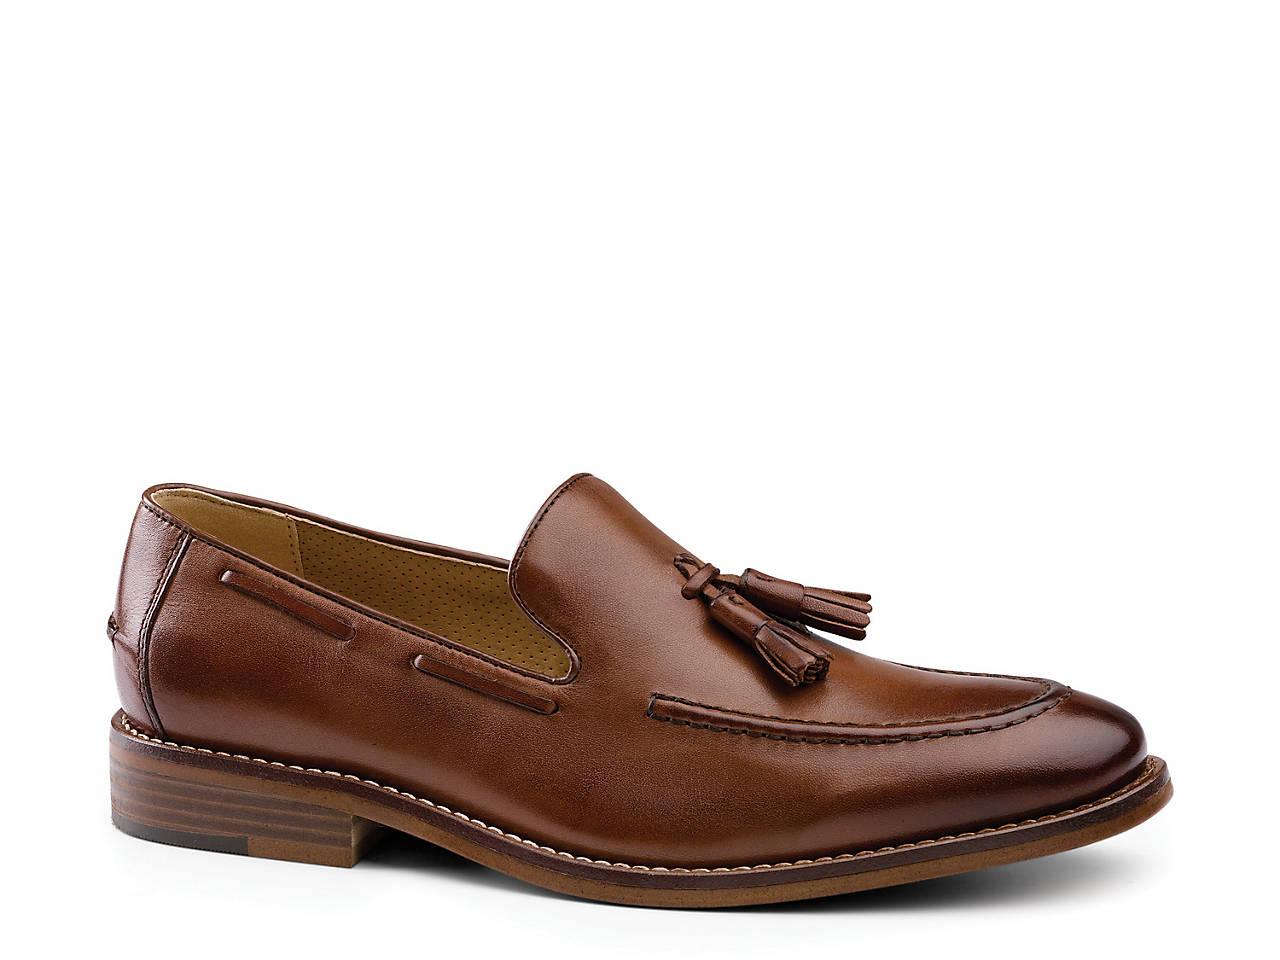 80cfe5916bf G.H. Bass   Co. Cooper Tassel Loafer Men s Shoes